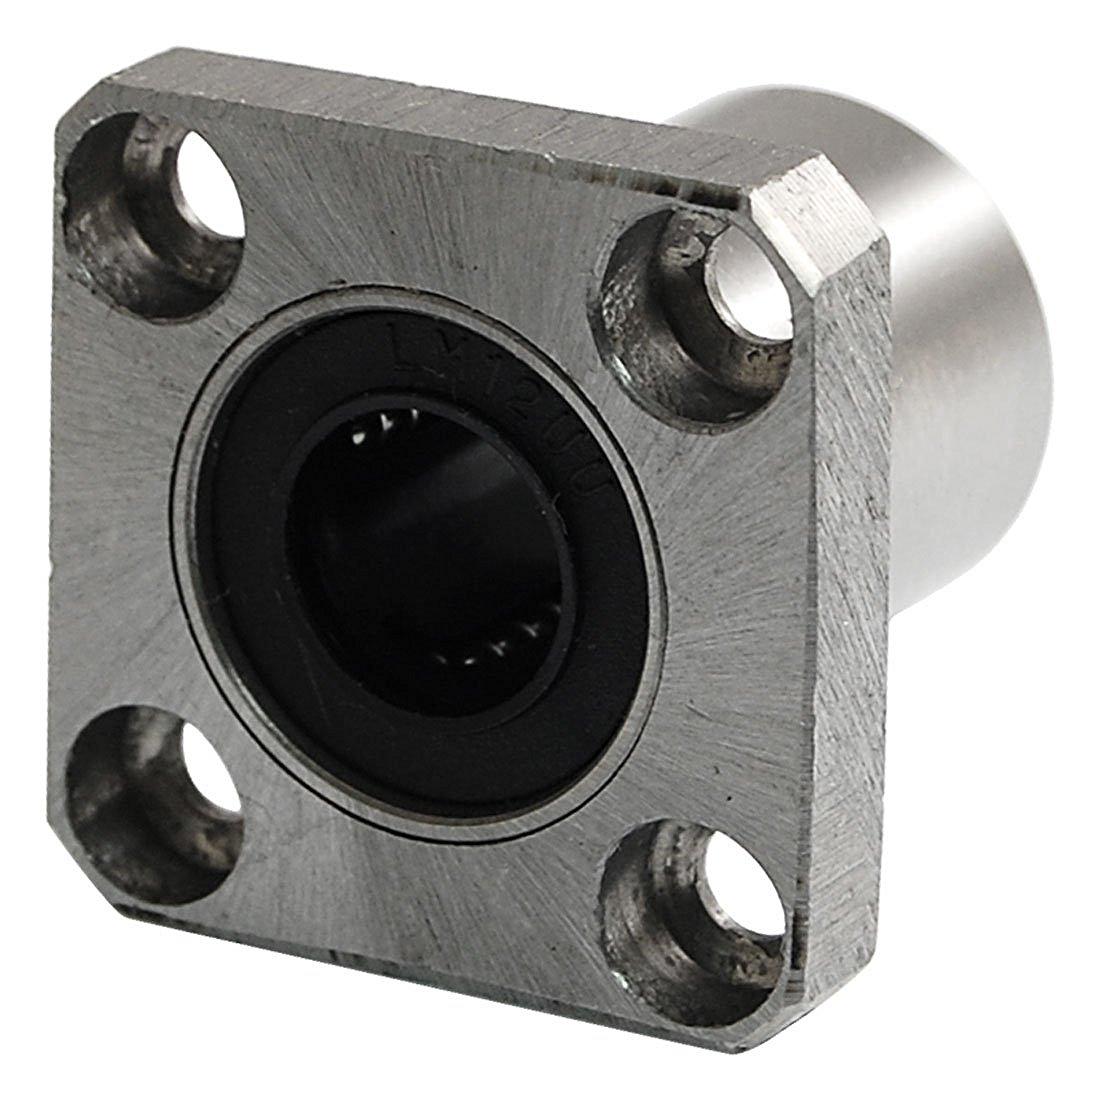 12mm Inner Dia 21mm OD LMK12UU Square Linear Ball Bearing accutex lt103 diamond wire guide inner dia 0 155mm manual upper